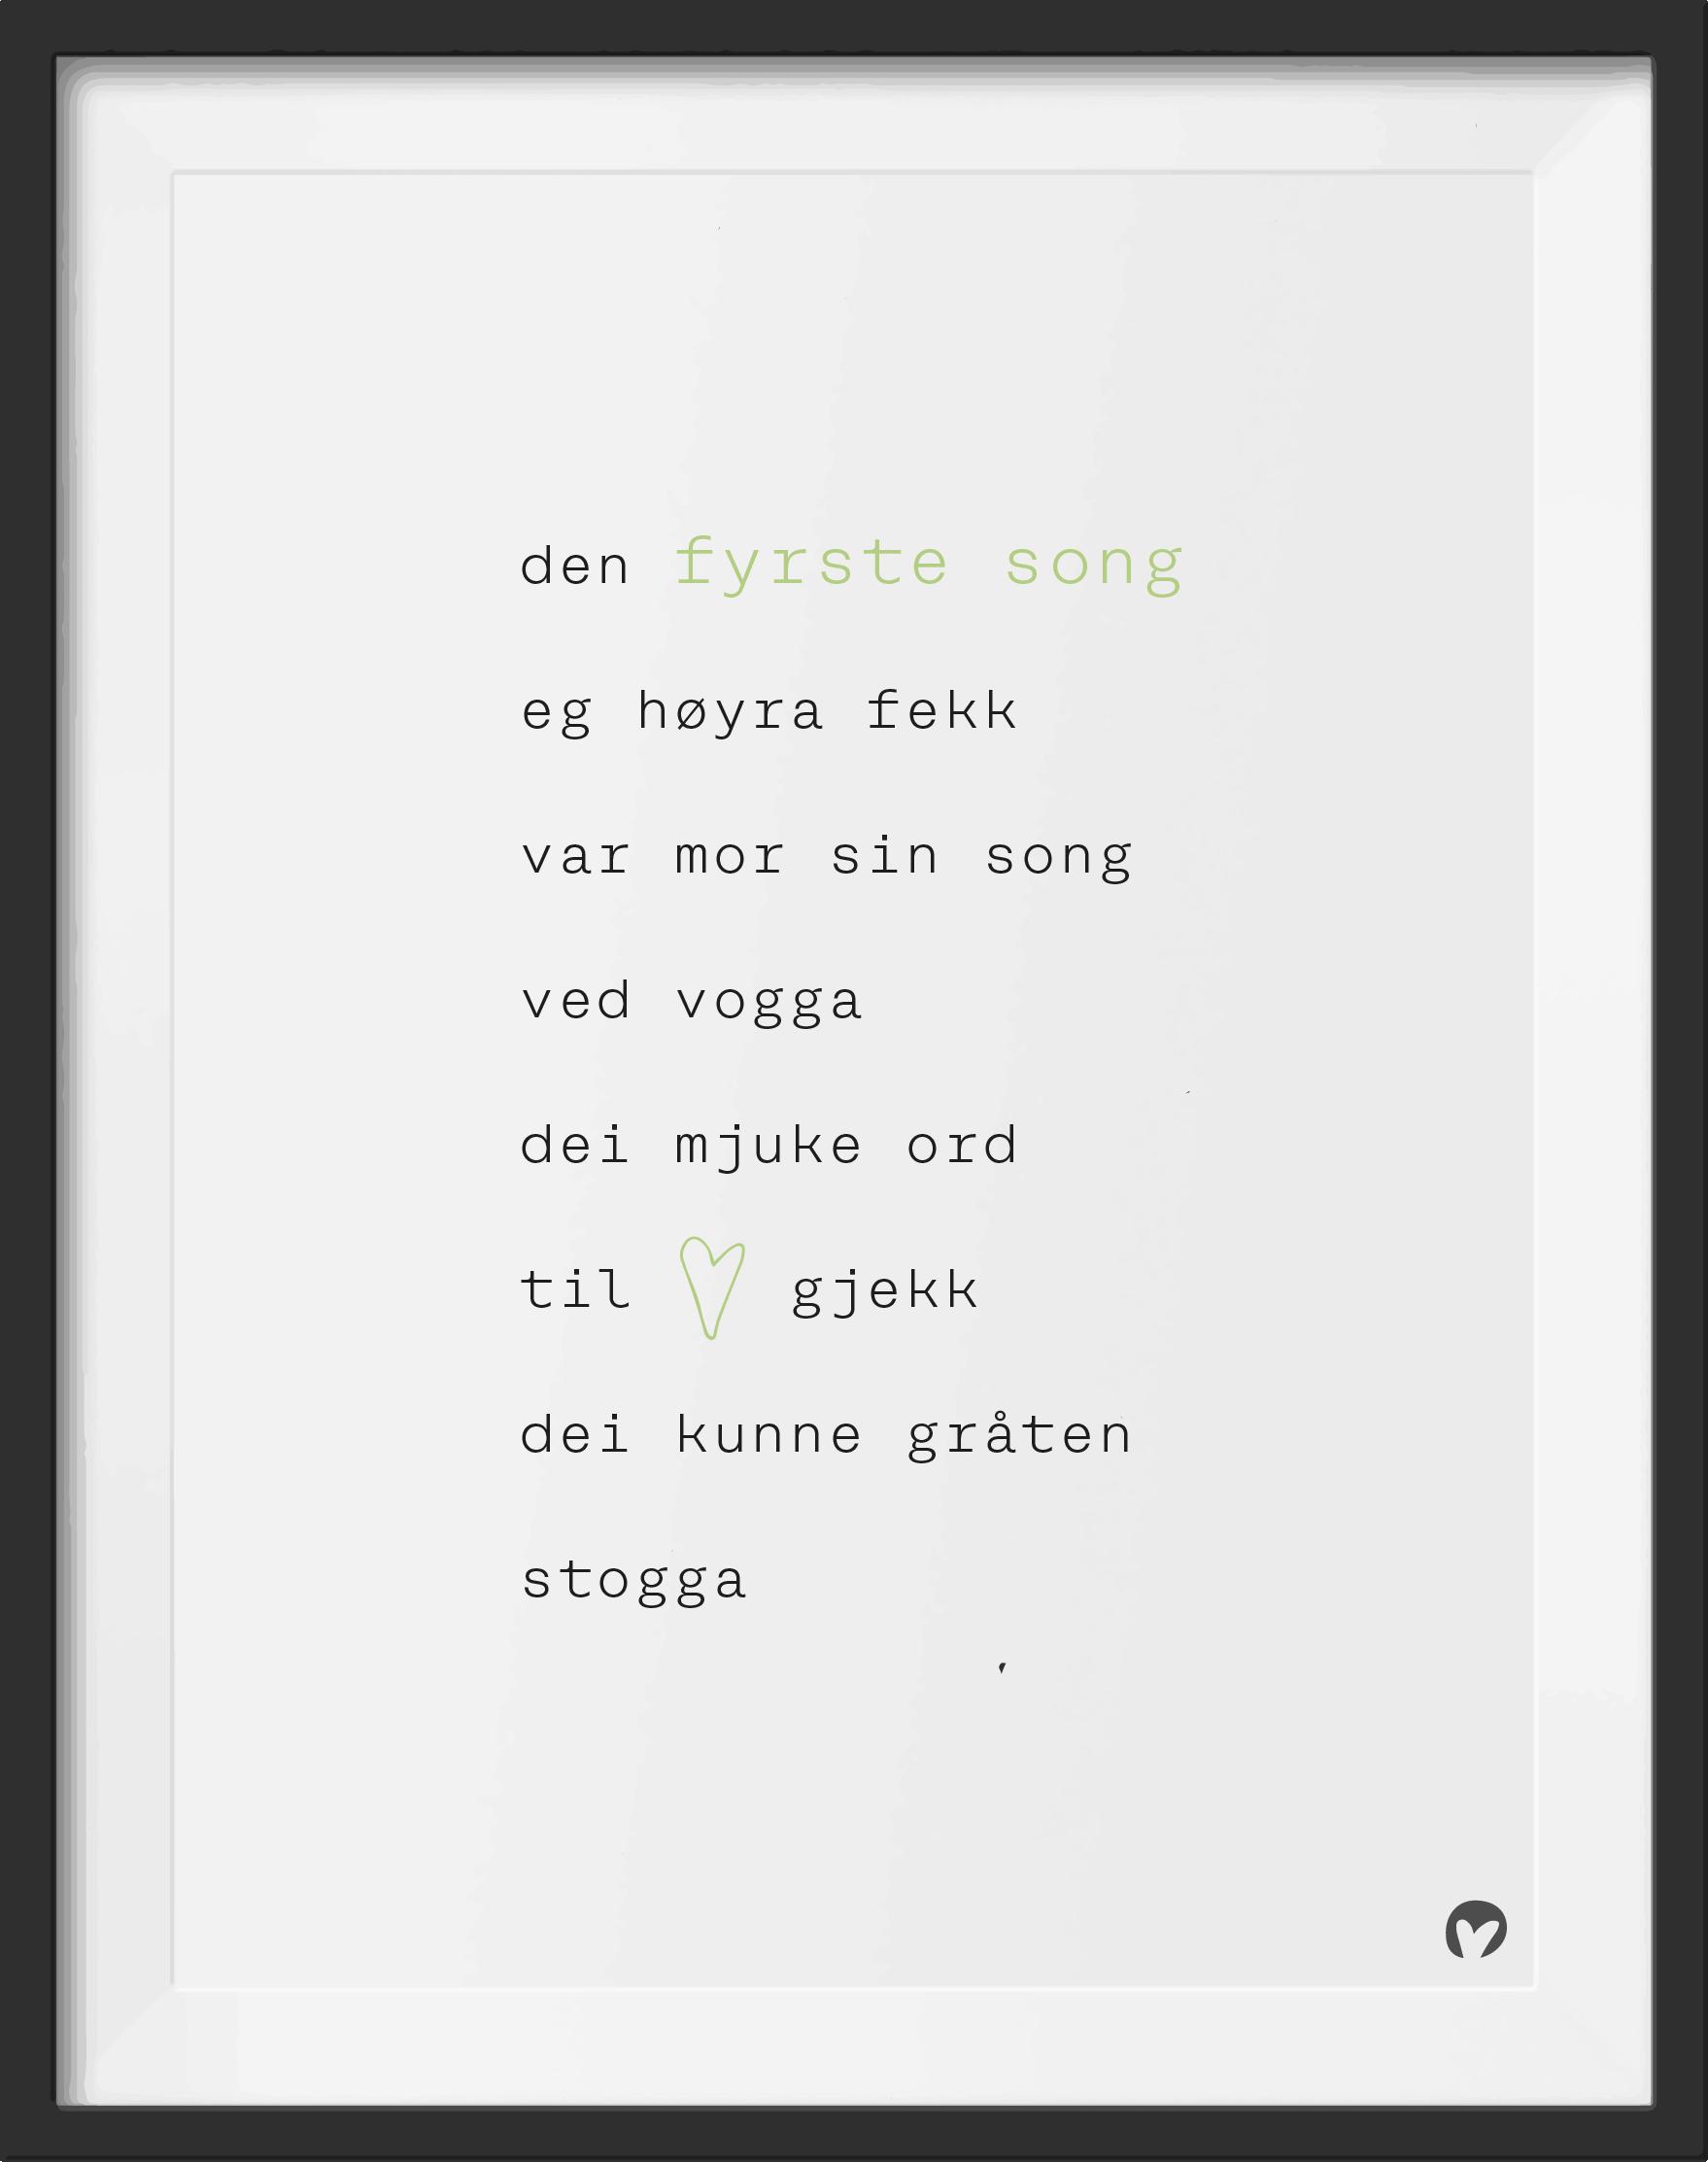 den fyrste song tekst